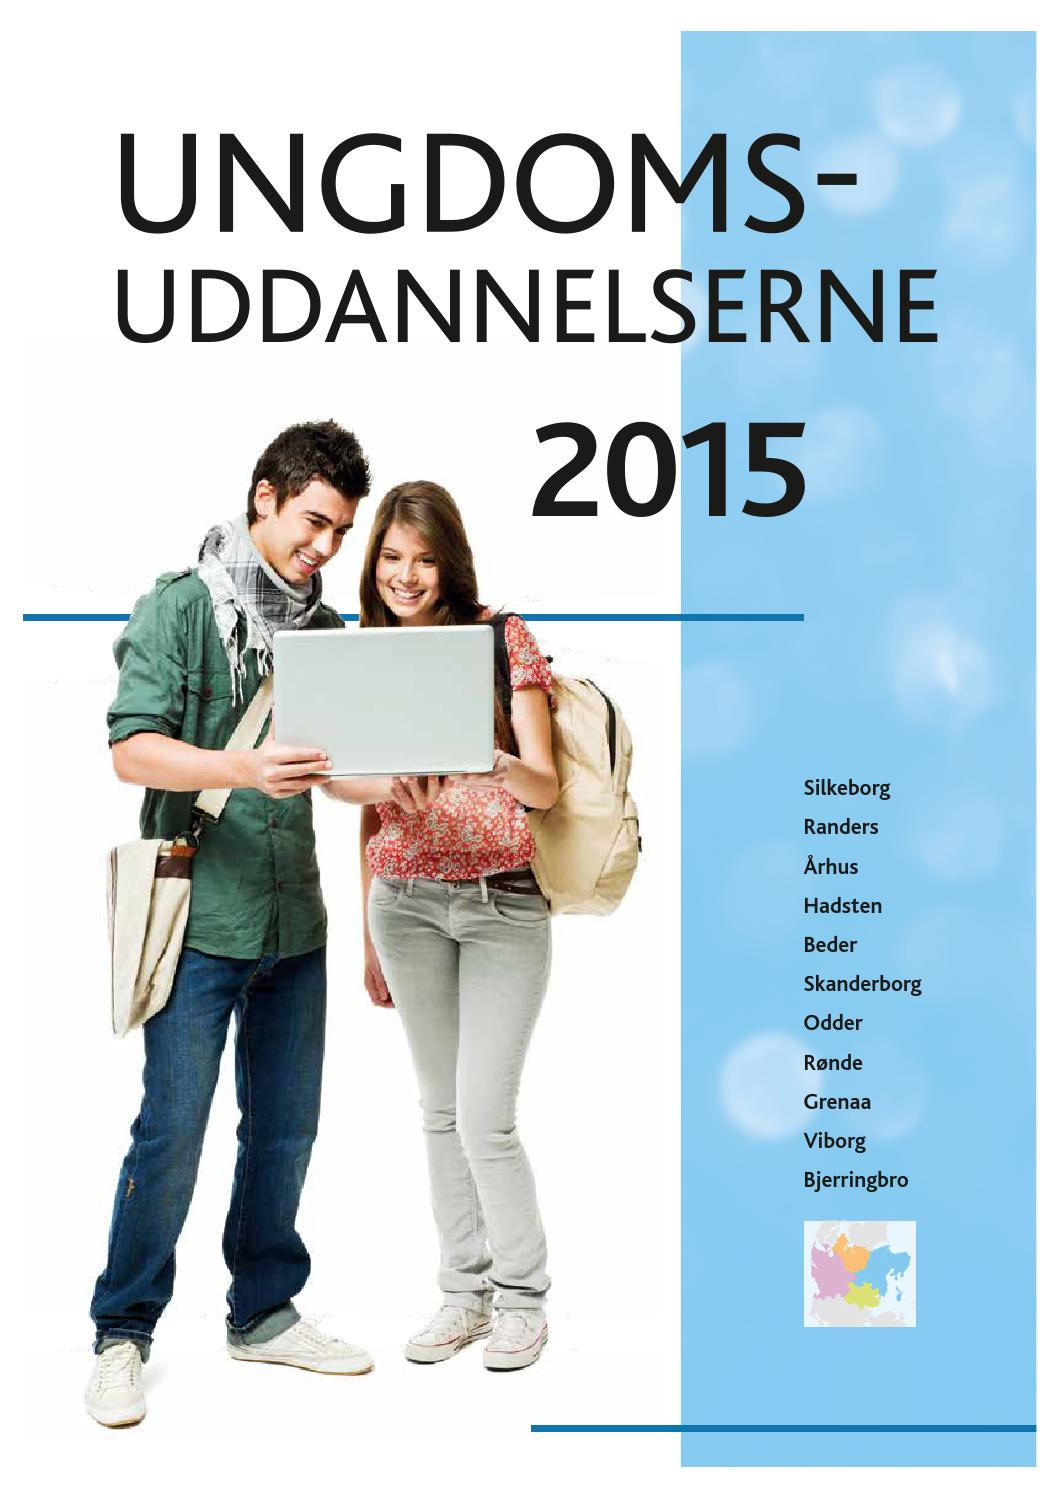 91cc60e59414 Aarhus - Ungdomsuddannelserne 2015 by Jesper Dudal - issuu